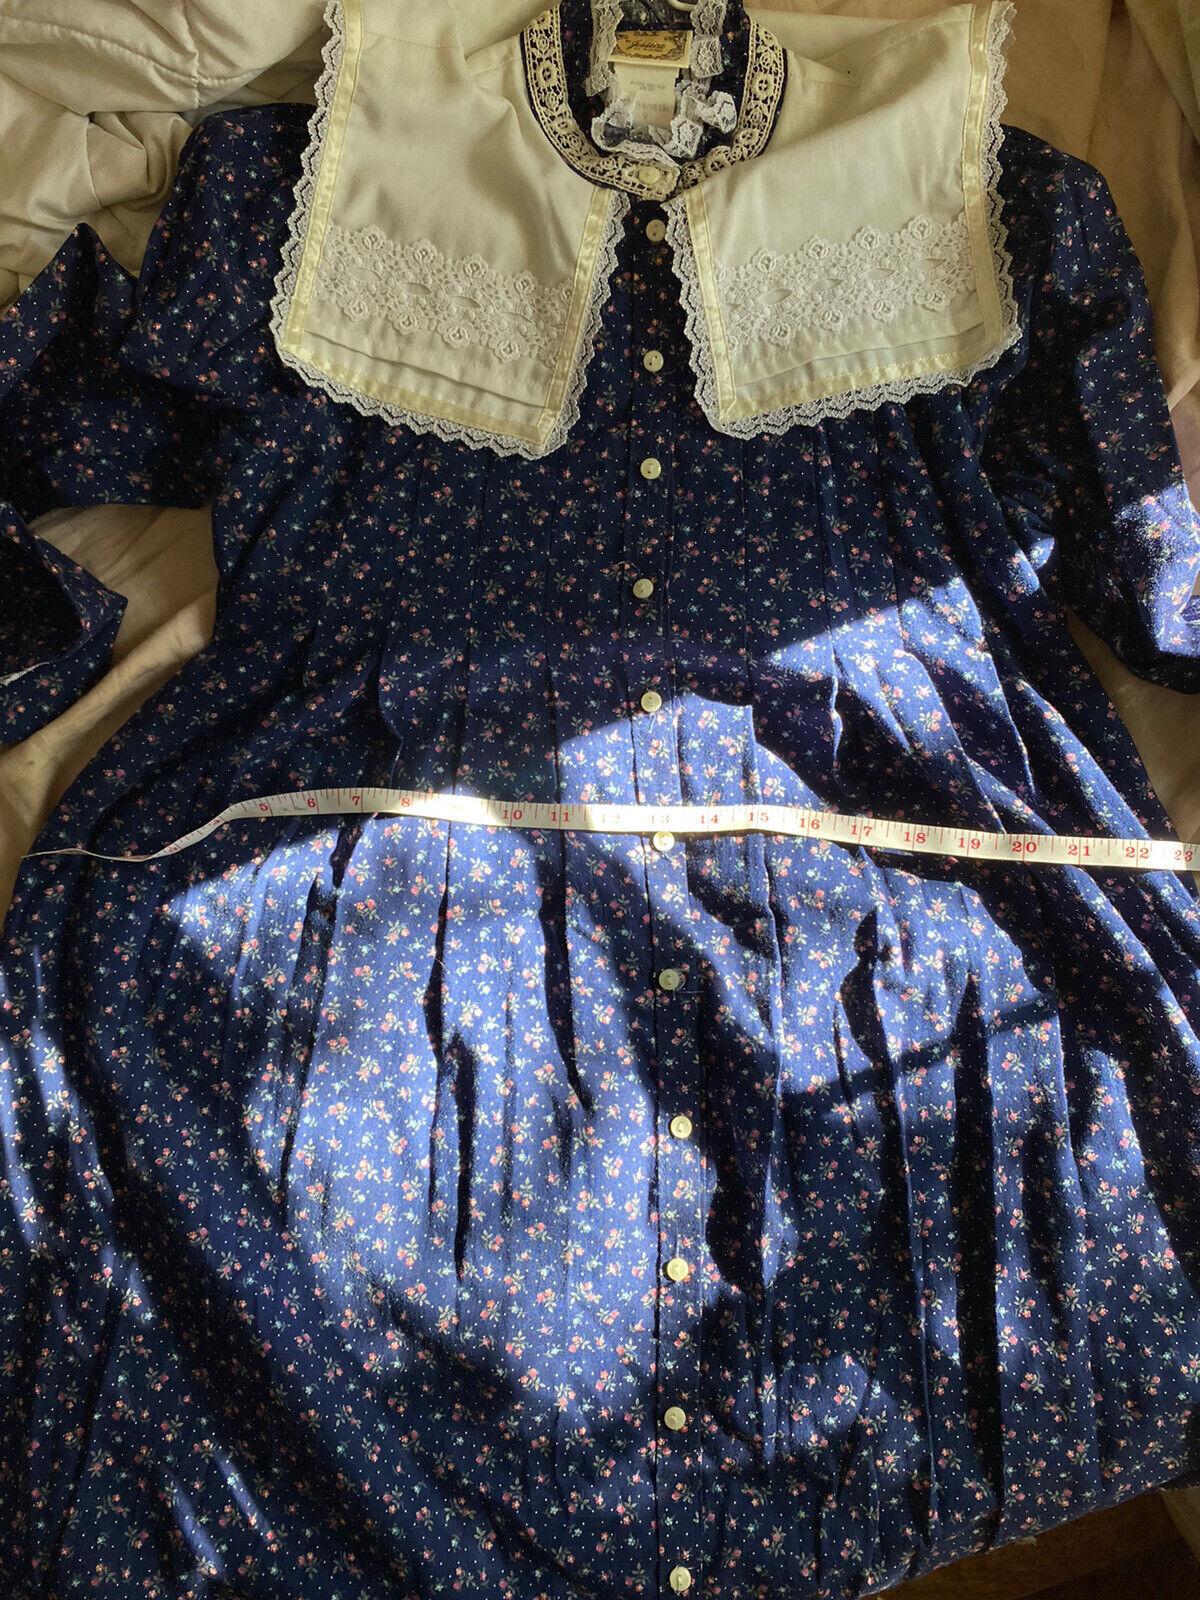 vintage gunne sax prairie dress (size 9) - image 5